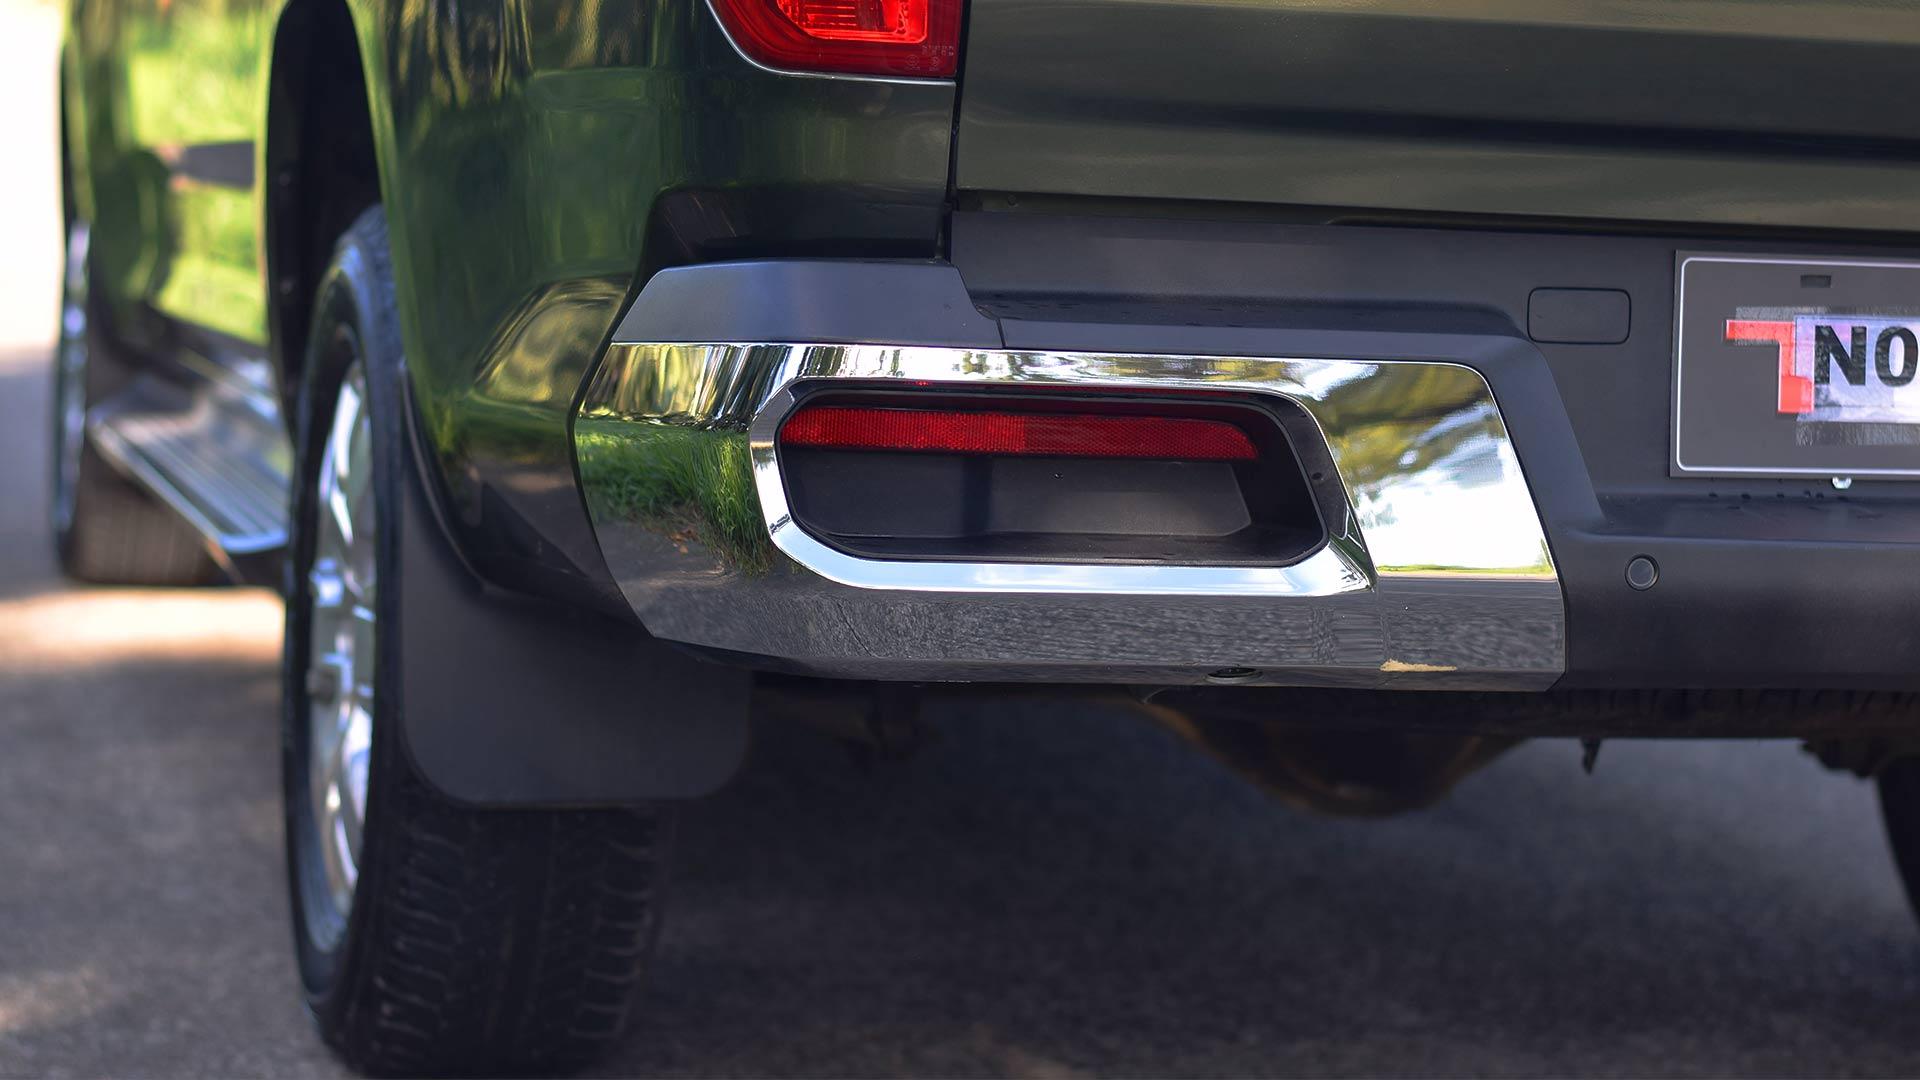 The Maxus T60 rear detail